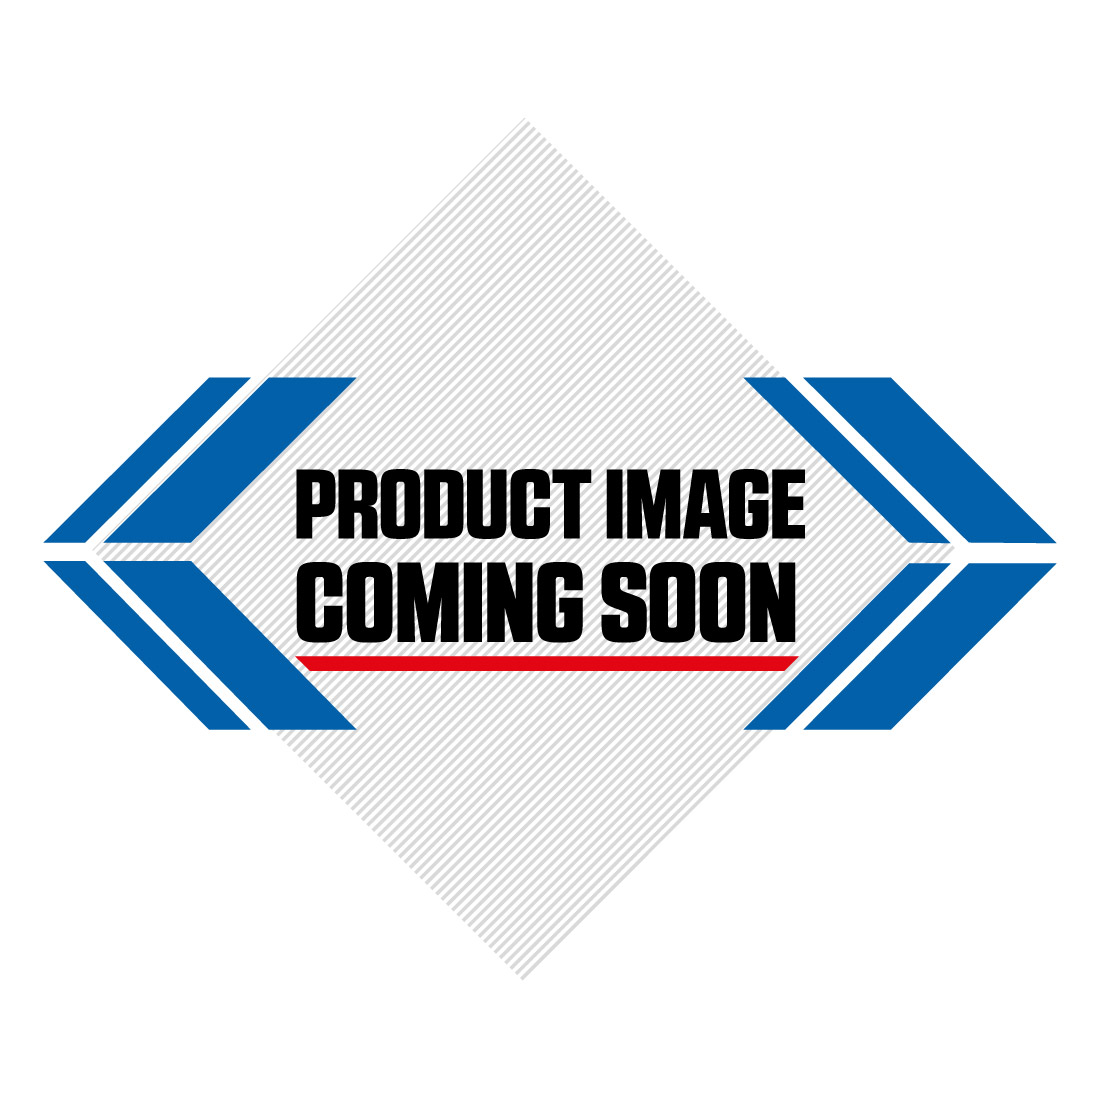 Renthal Twinring Rear Sprocket KTM SX SX-F EXC EXC-F Husqvarna TC FC TE FE - Black Image-4